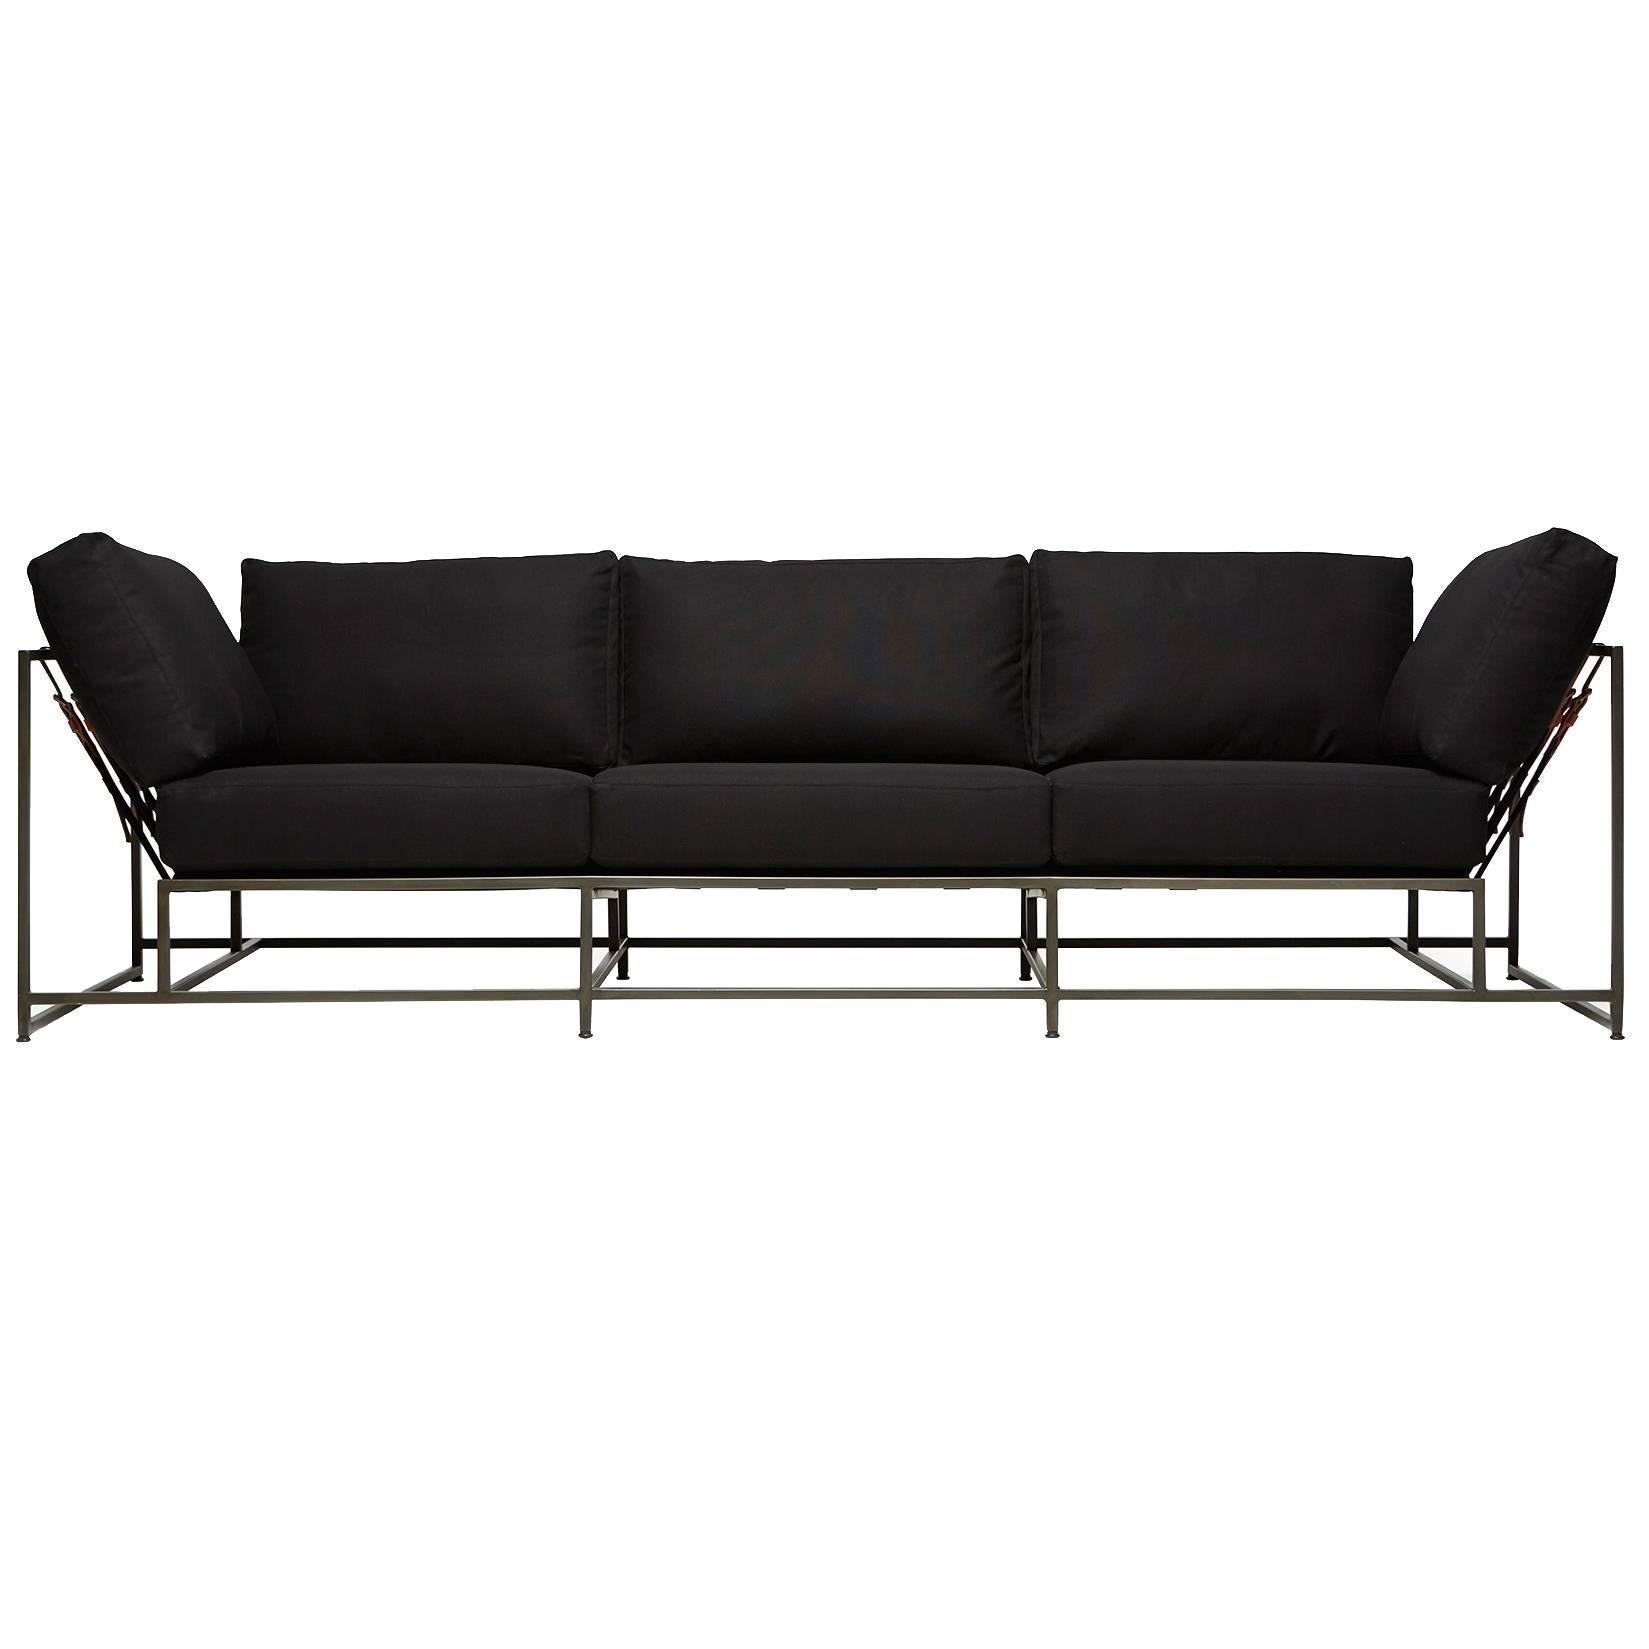 Black Canvas and Blackened Steel Sofa